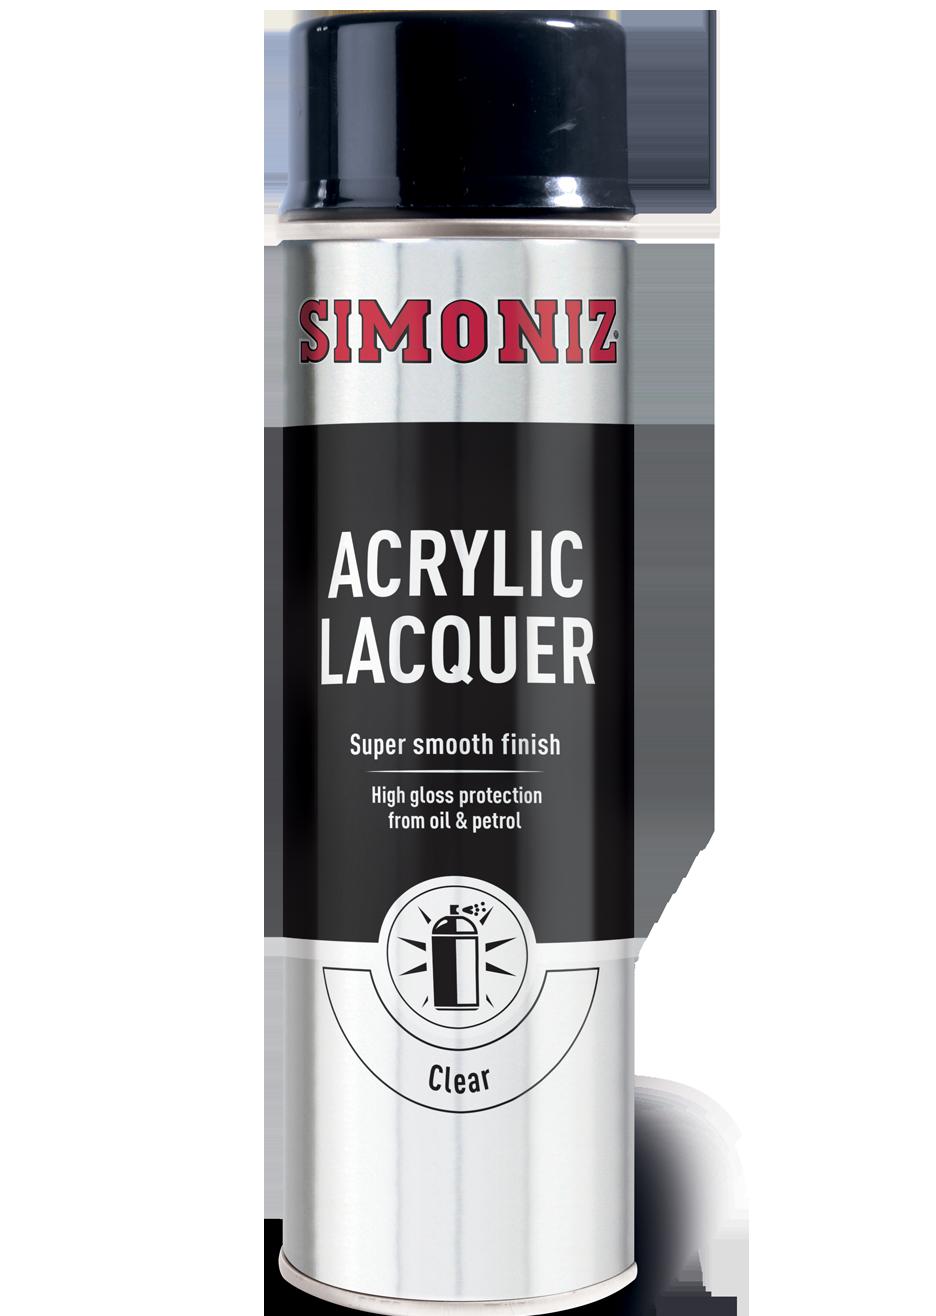 28 Matt Lacquer Spray Paint X1 X3 X6 X12 500ml Car Spray Pa Motip Black Satin Lacquer Spray